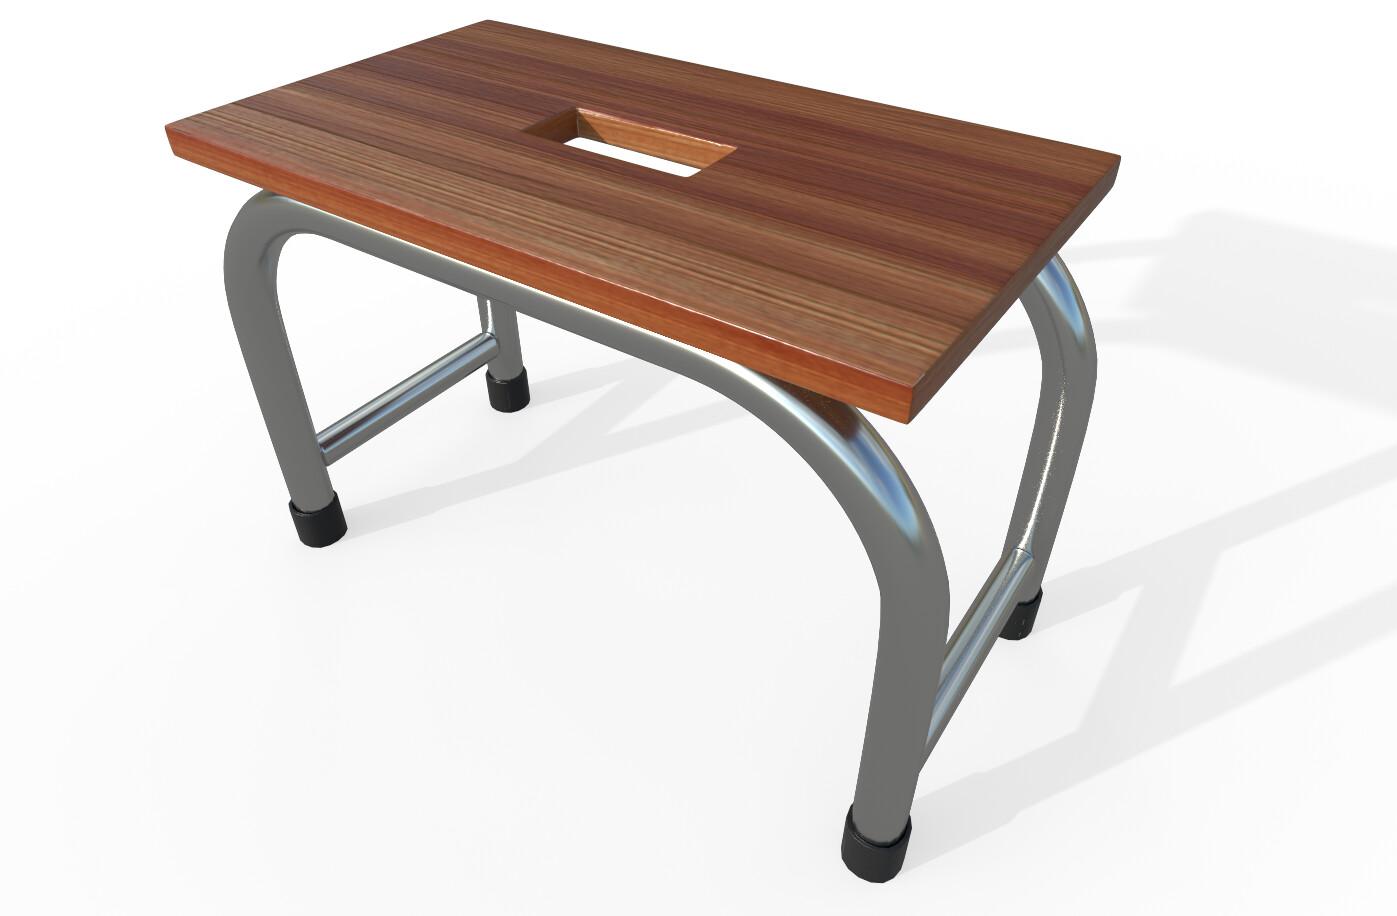 Joseph moniz footstool001d